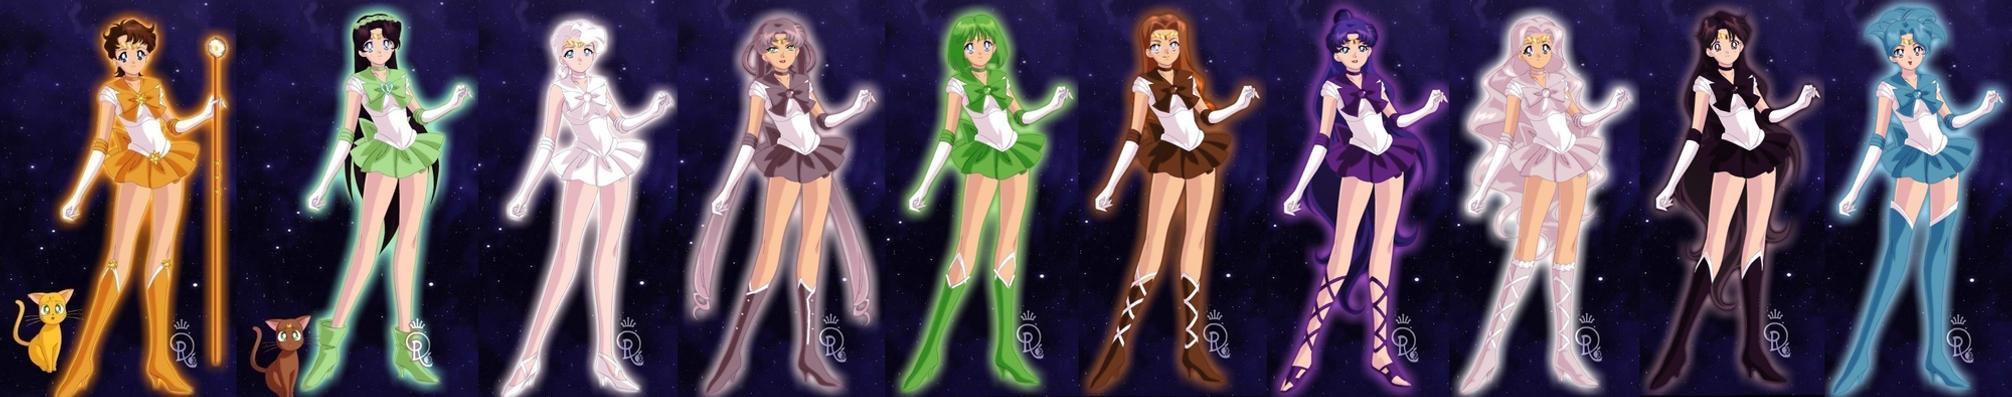 Senshi Maker - Senshi Team by TheAnomally